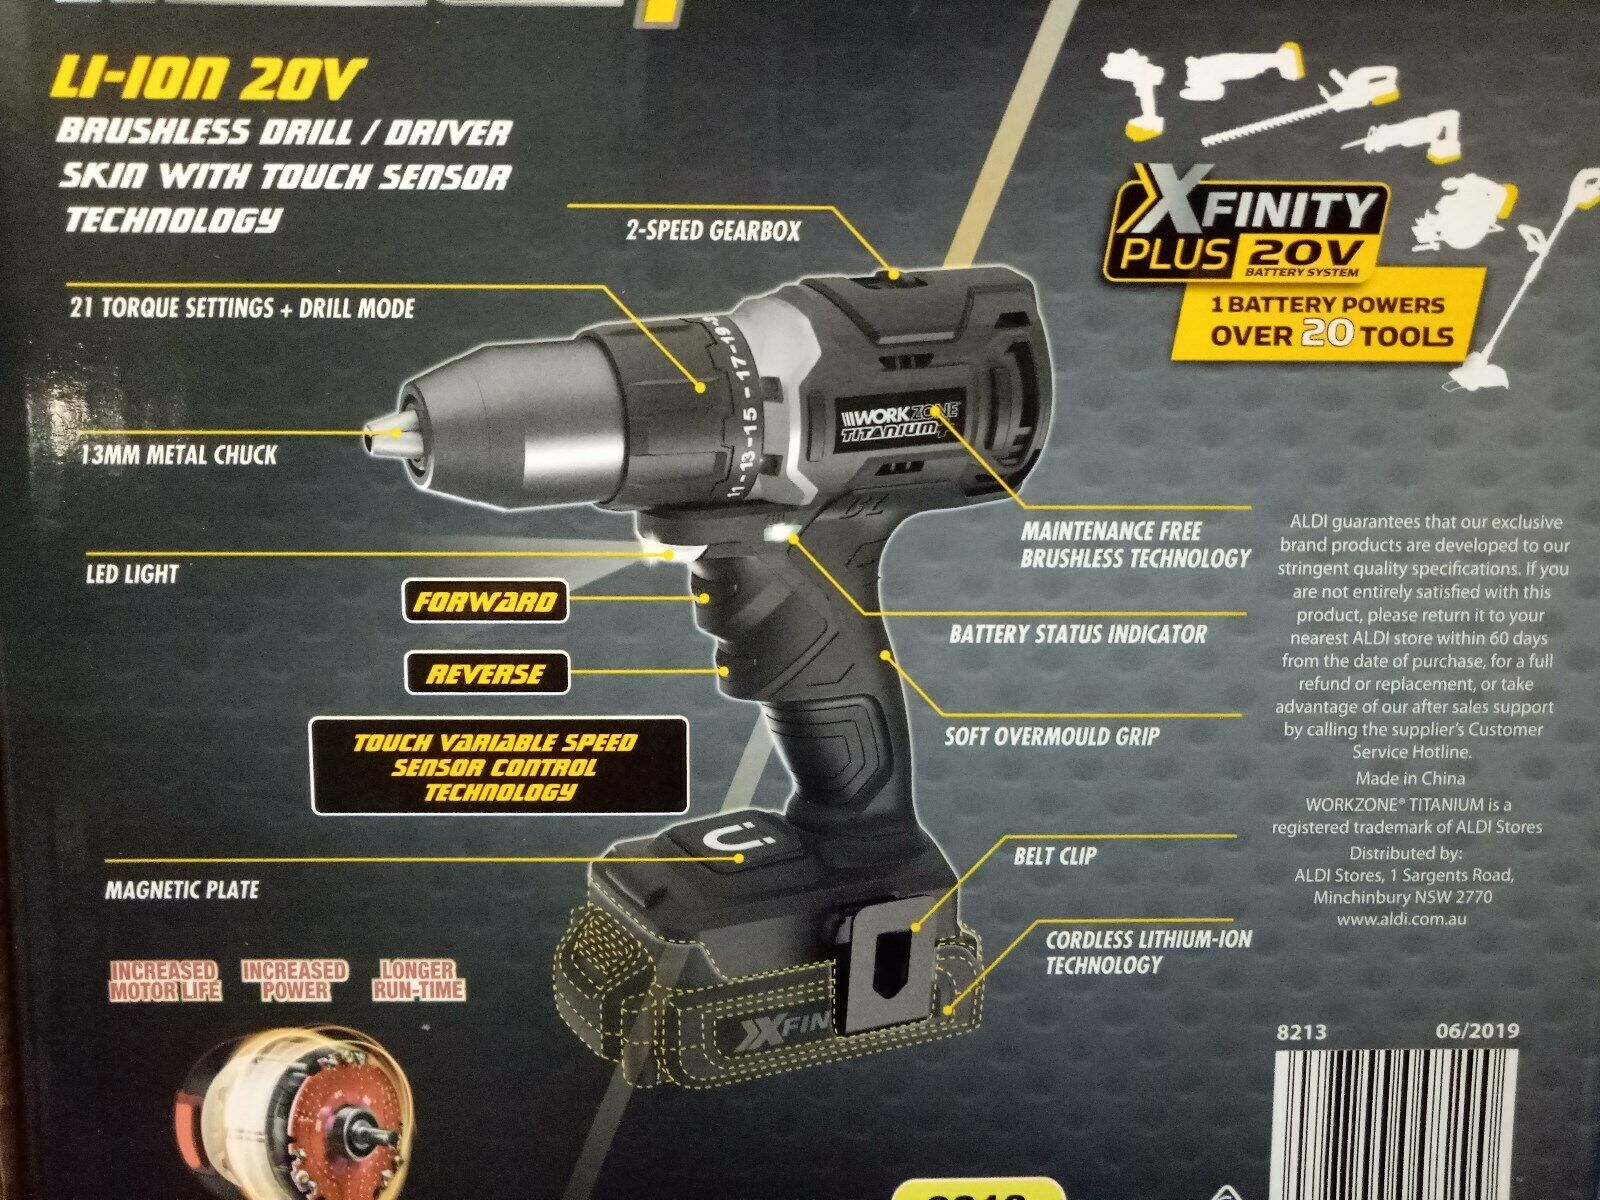 NEW BRUSHLESS WORKZONE XFINITY 20V CORDLESS DRILL SKIN DRIVE